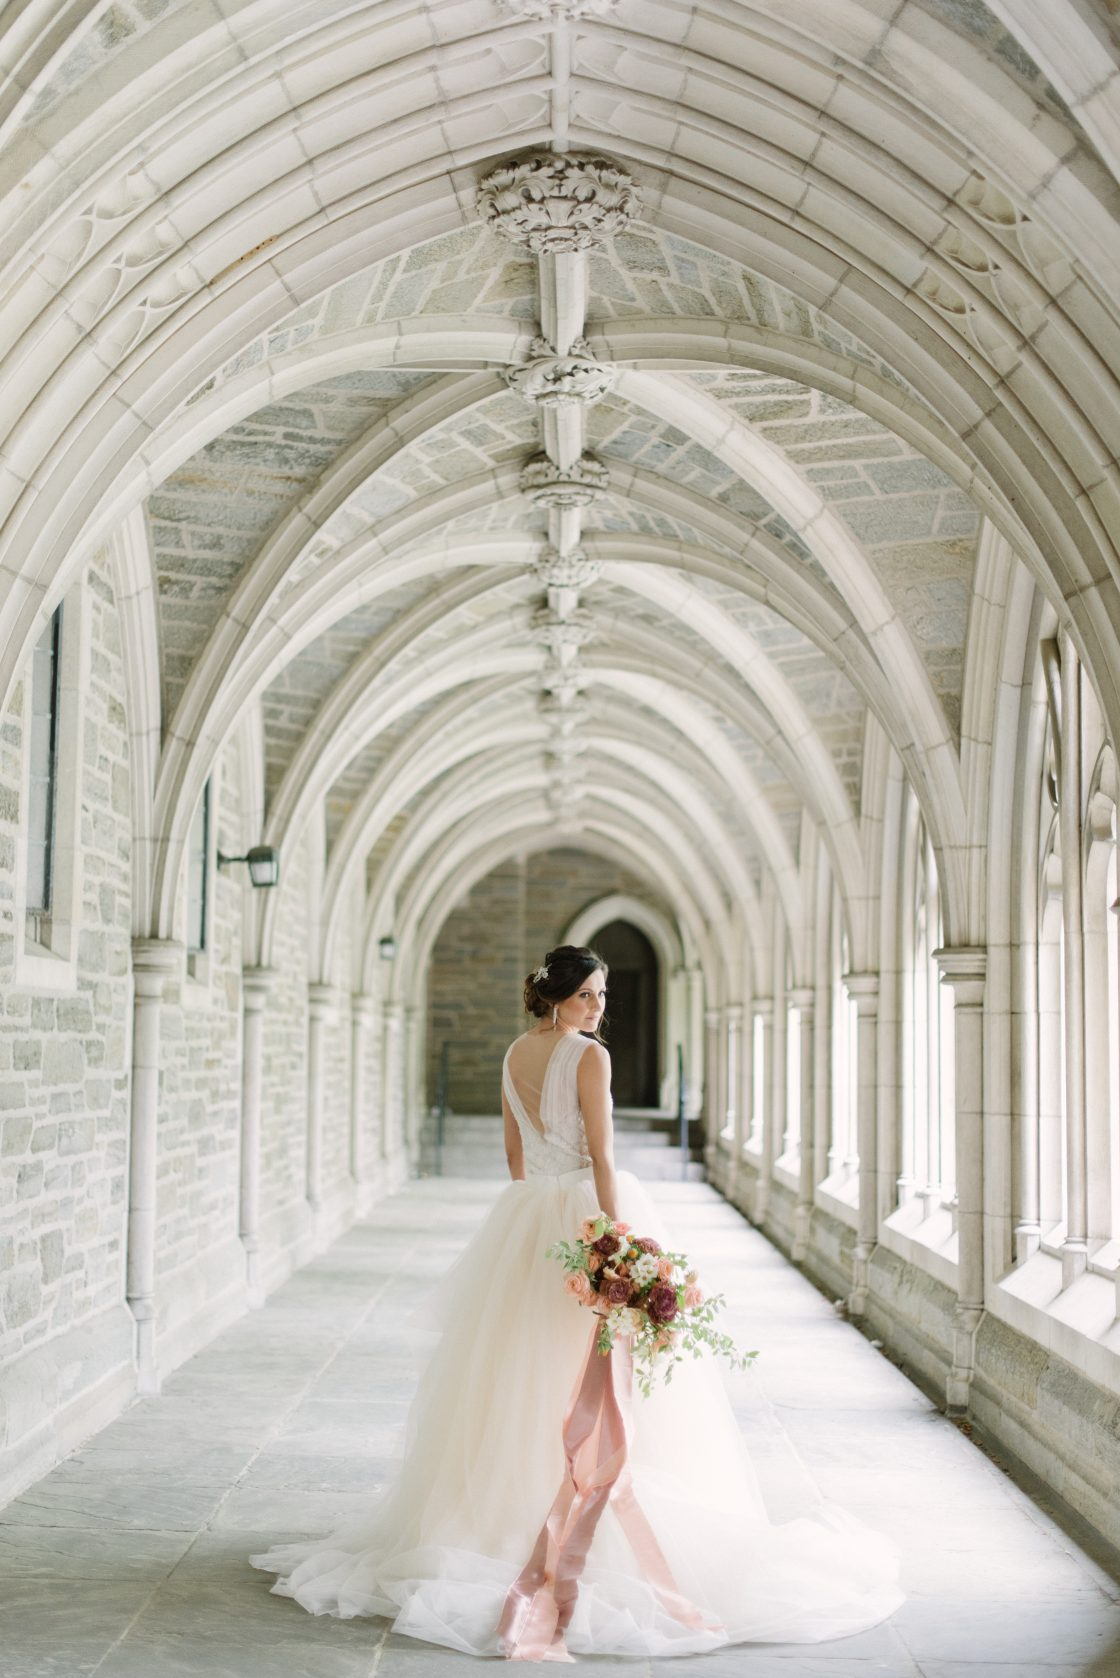 European Inspired Bridal Gown